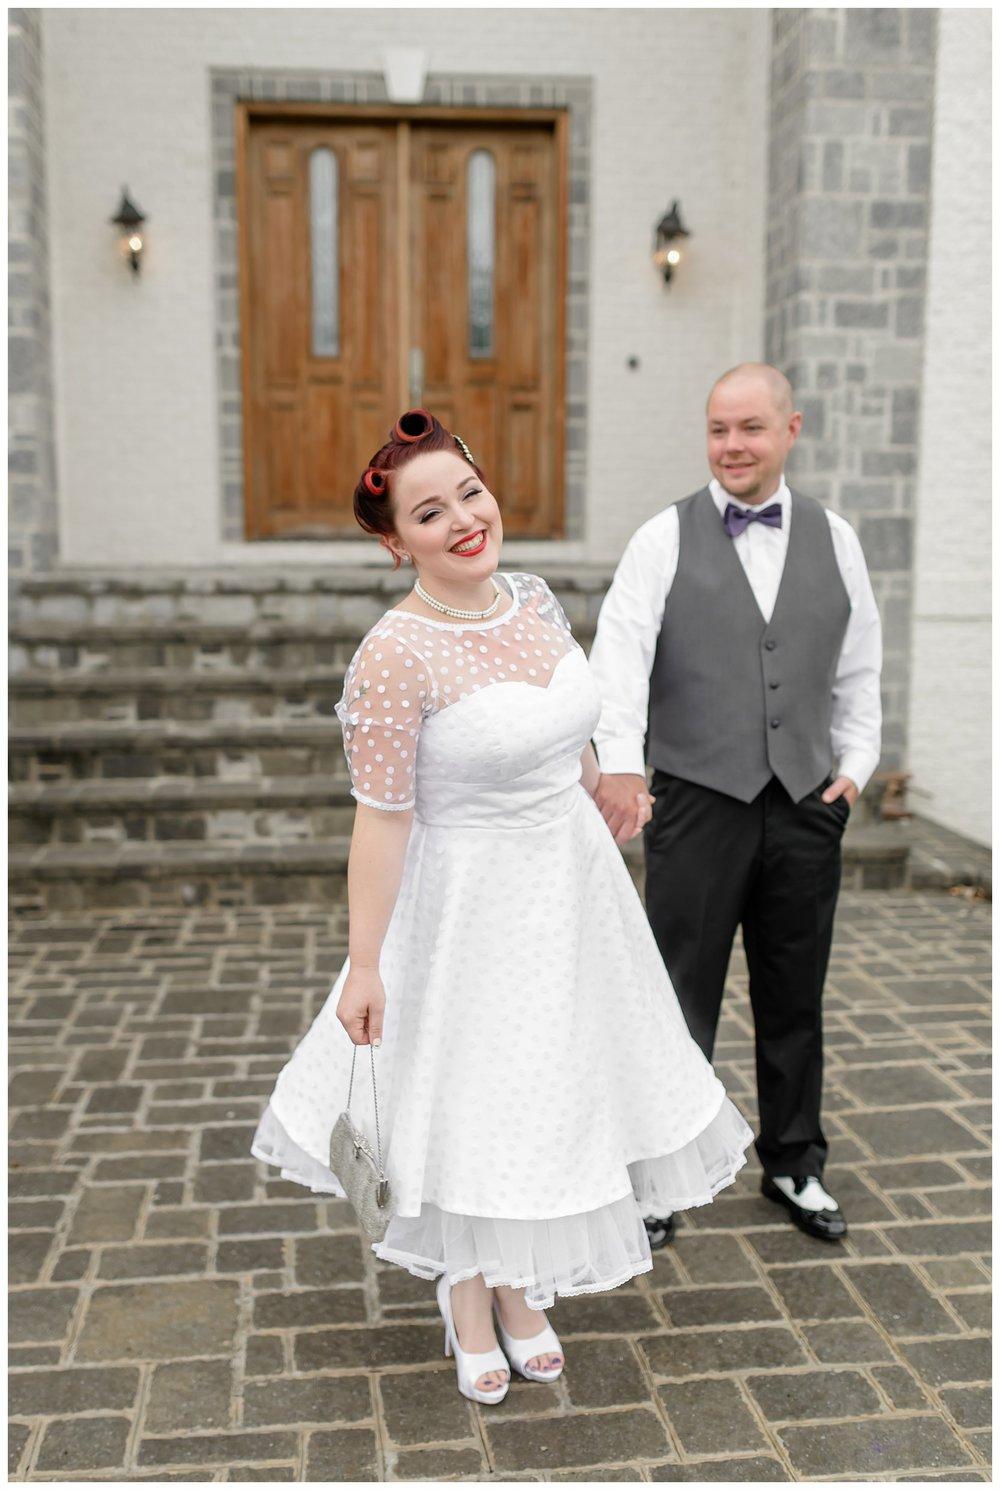 Charleston-South-Carolina-Wedding-Photographer-Engagement-Photography-green-eco-friendly-stephanie-kopf-photography-36.jpg